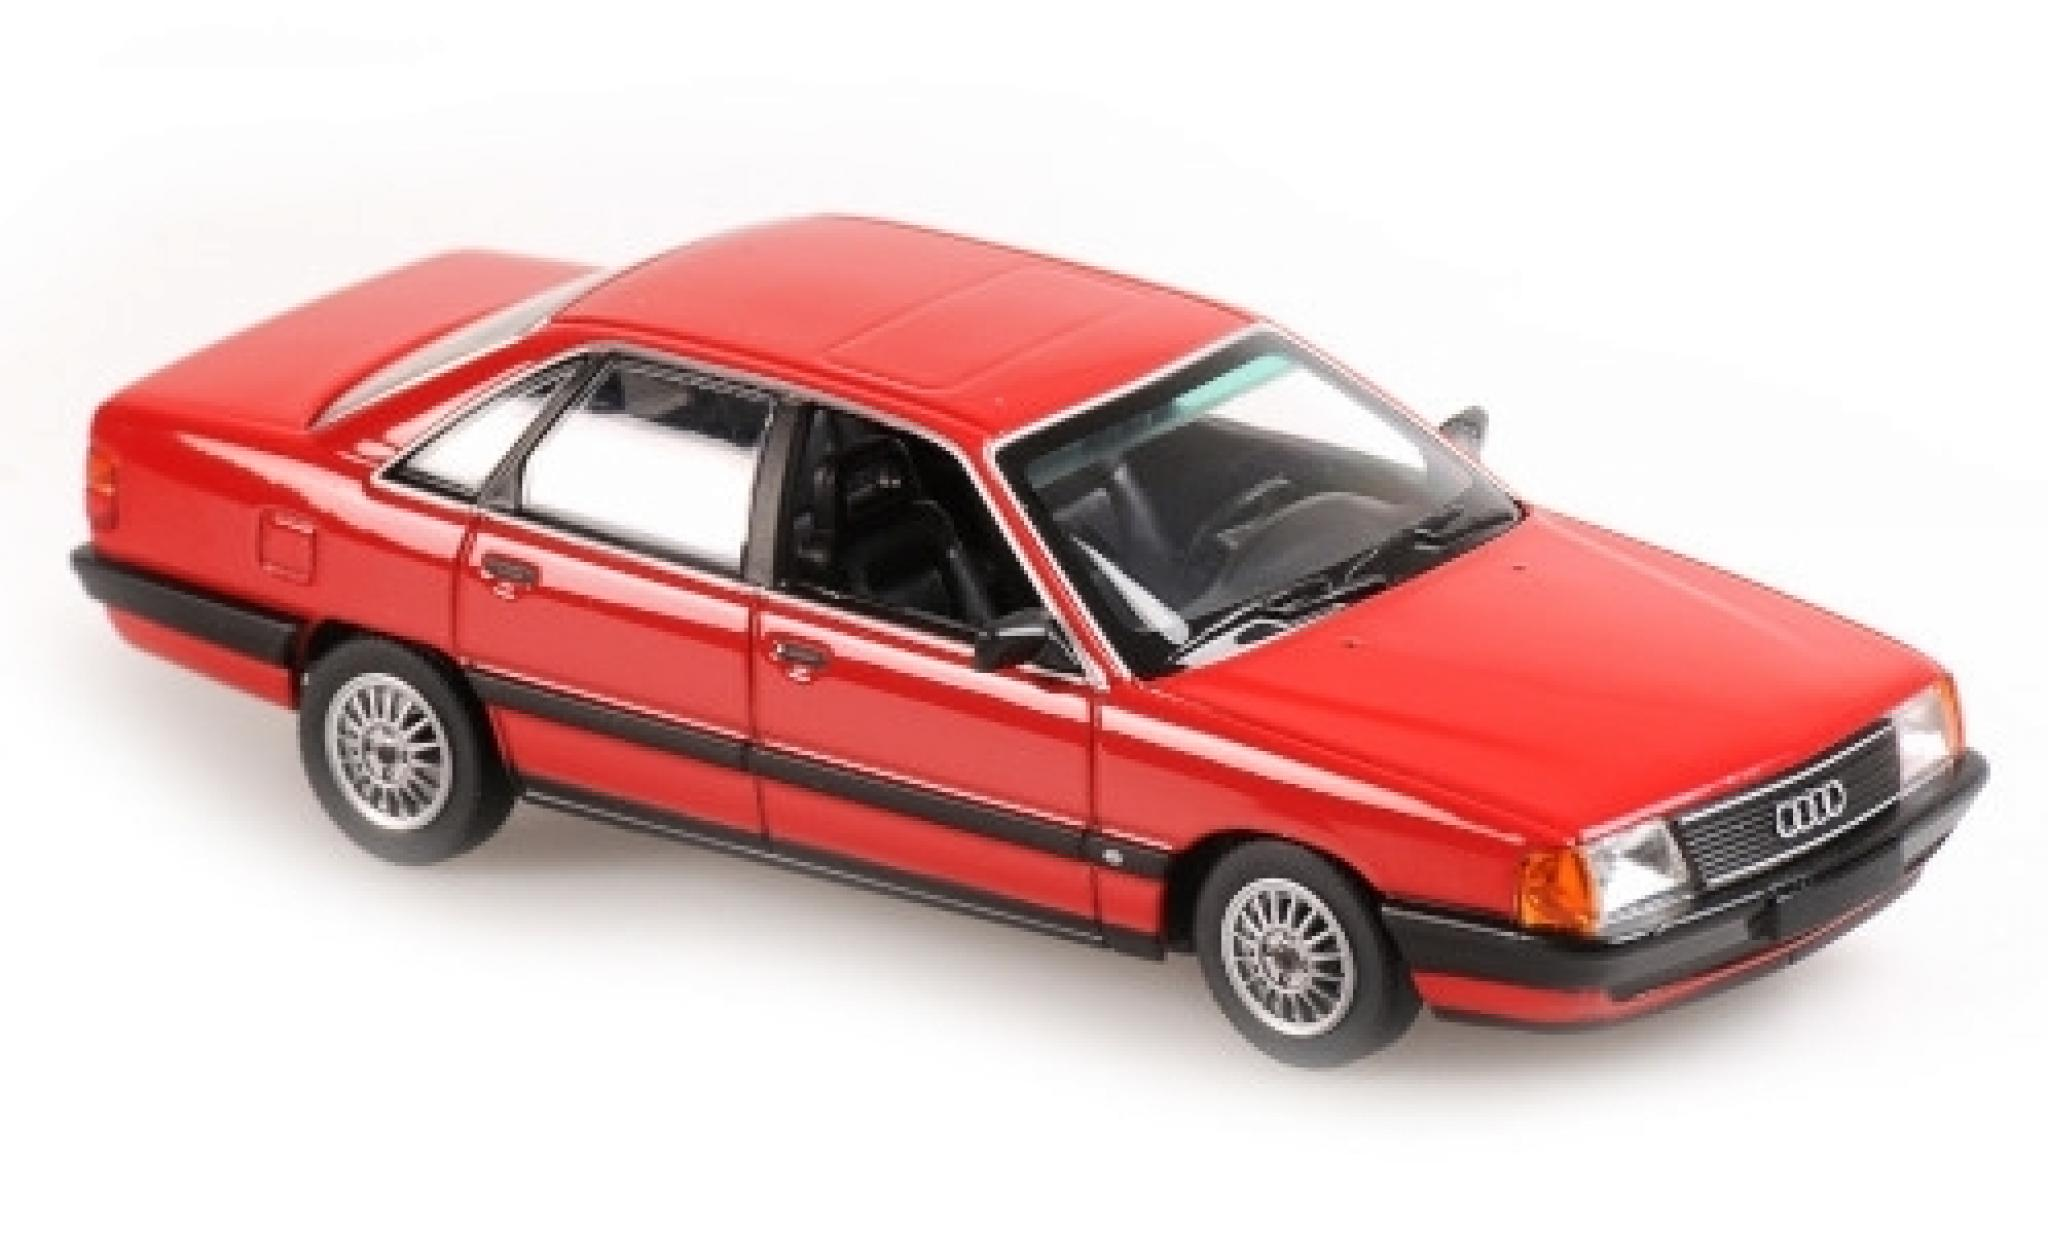 Audi 100 1/43 Maxichamps rouge 1990